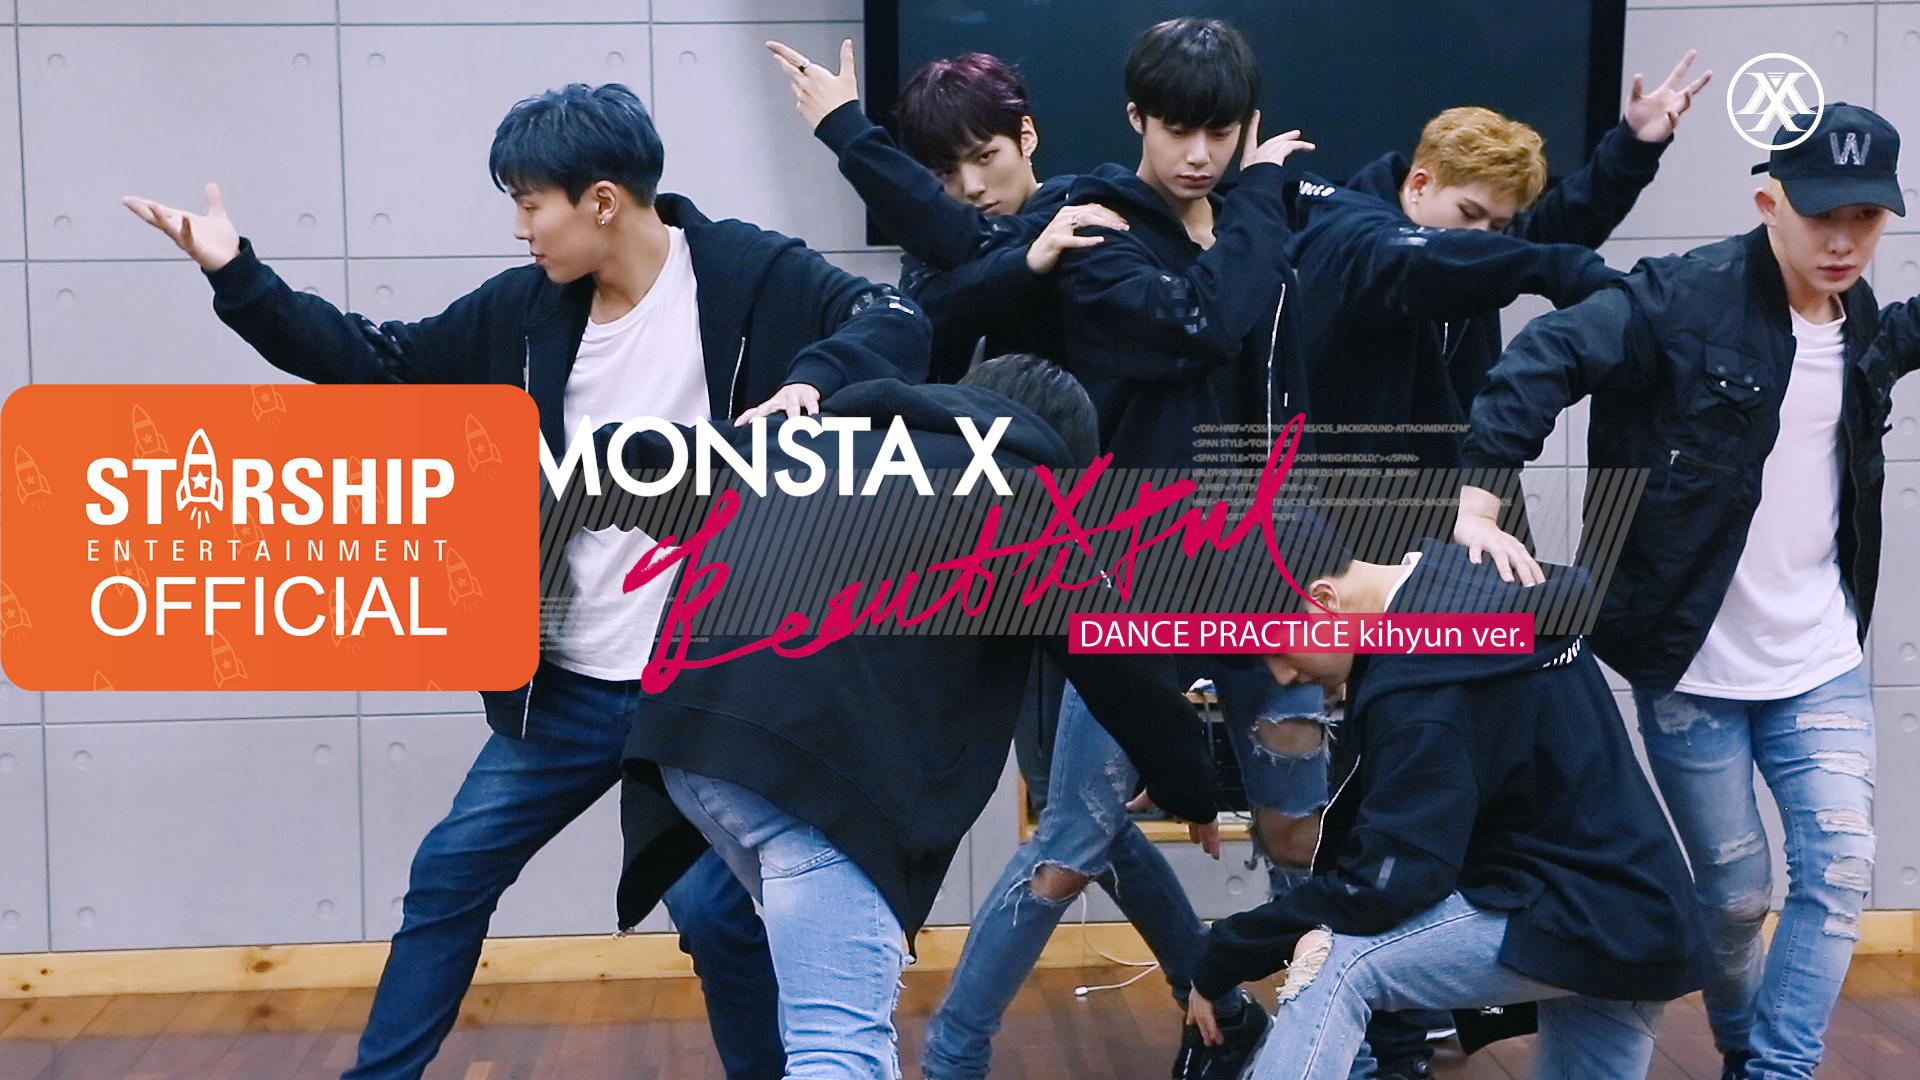 [KIHYUN][Dance Practice] 몬스타엑스 (MONSTA X) - 아름다워 (BEAUTIFUL)